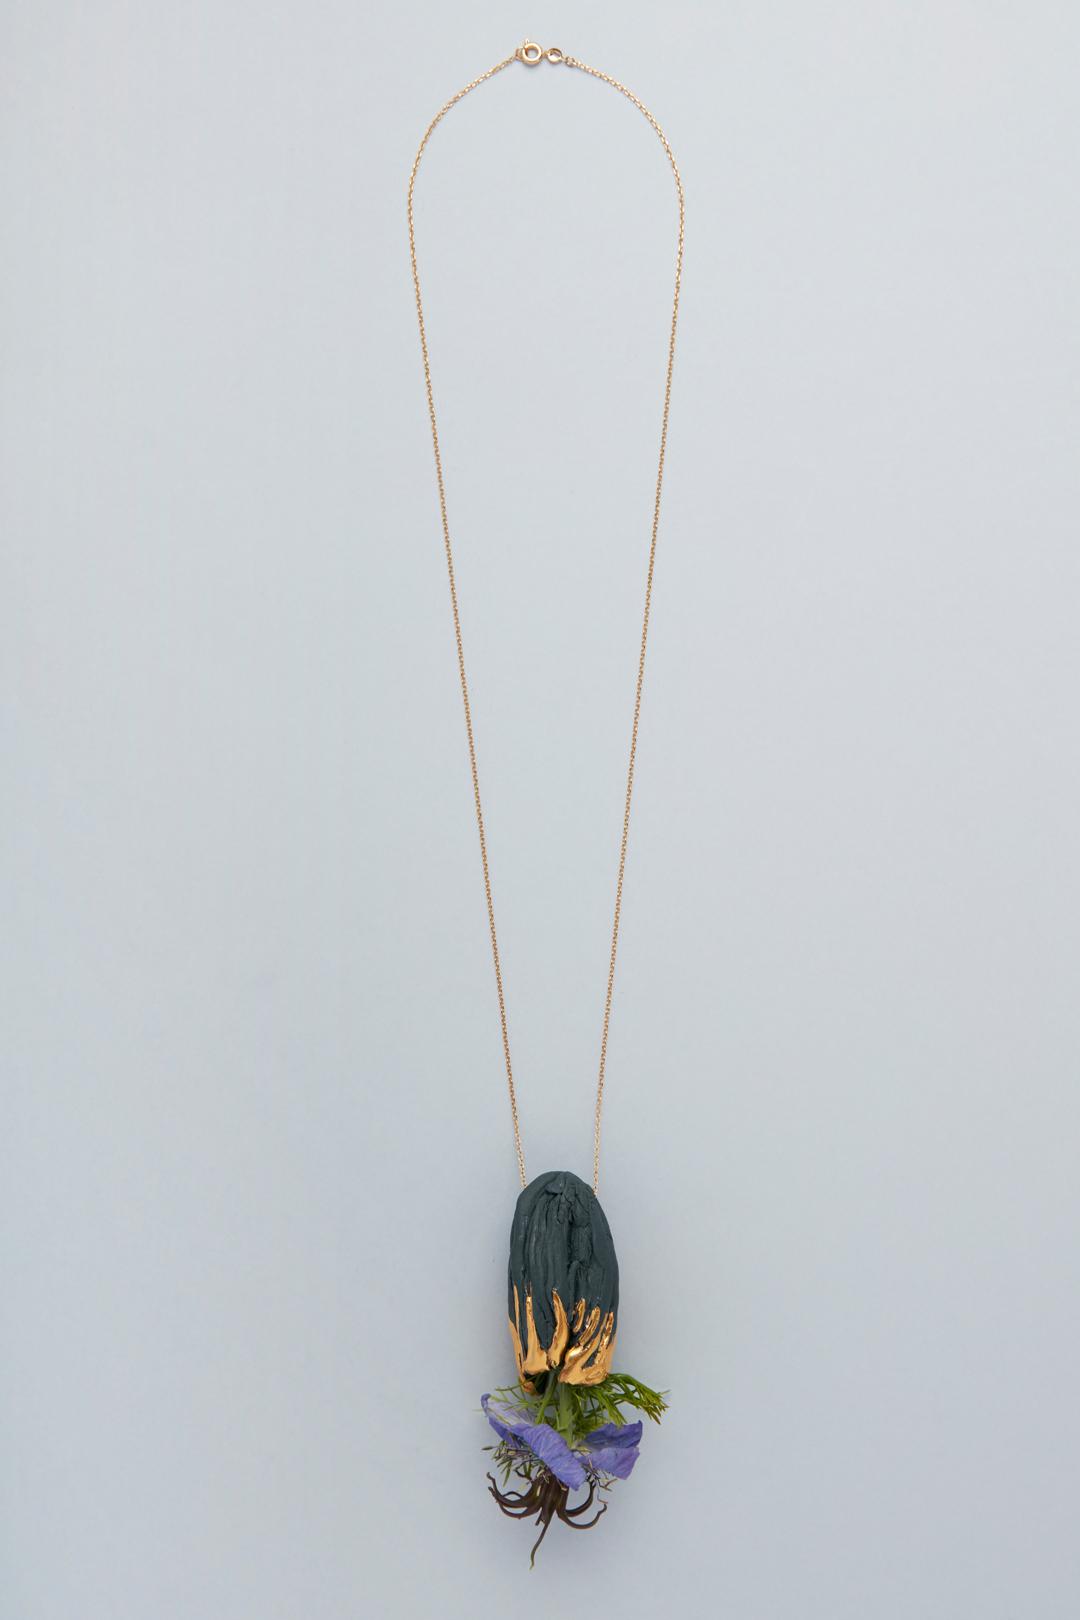 jordane-somville-bijou-contemporain-jewelry-vegetal-porcelaine-N31.jpg